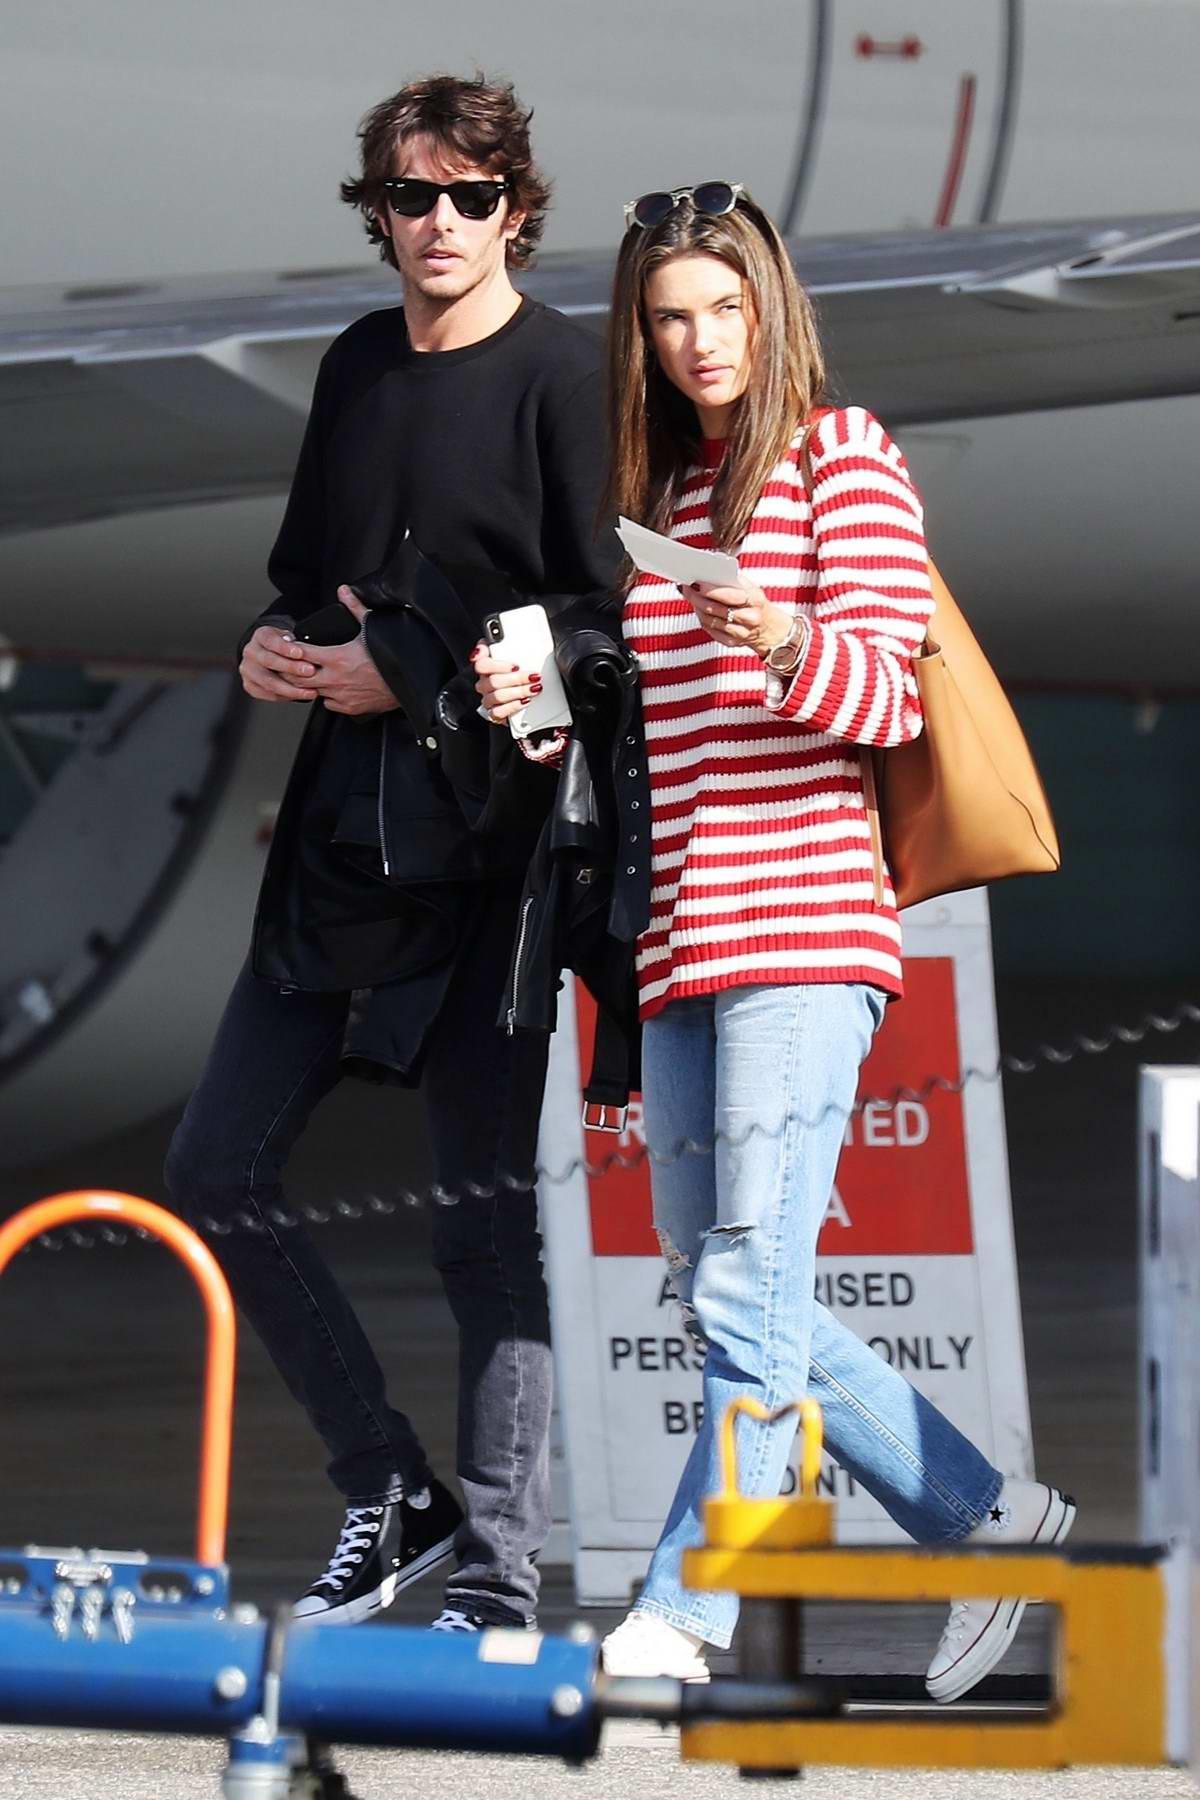 Alessandra Ambrosio and Nicolo Oddi arrives to catch a private jet at the airport in Burbank, California